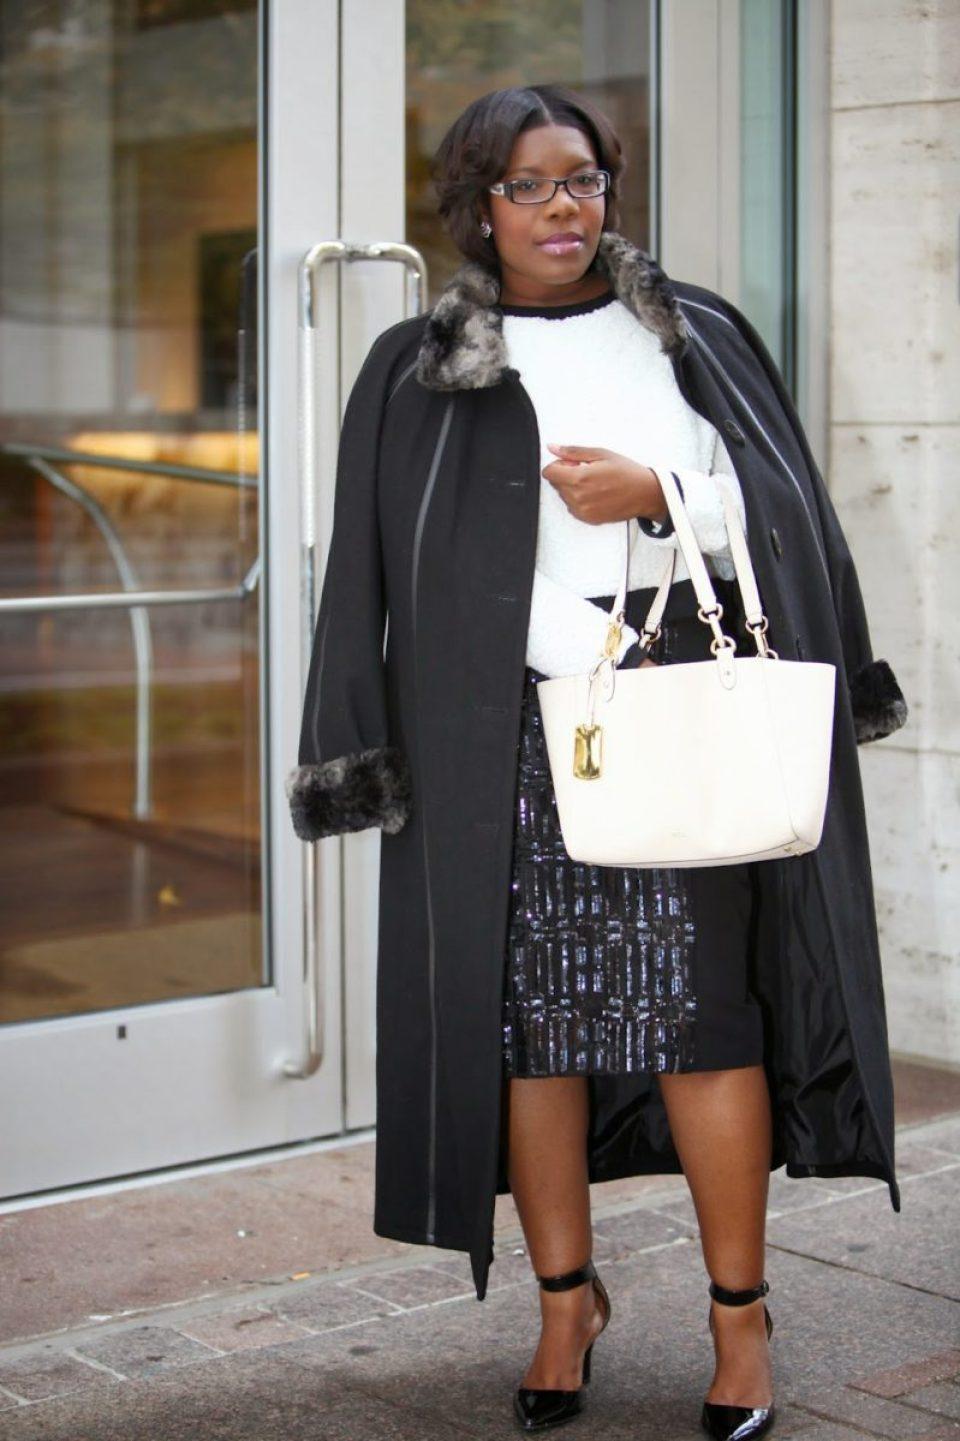 LaVonndra-Johnson-0366-960x1441 Elle VJ : Chic, Stylish and Southern